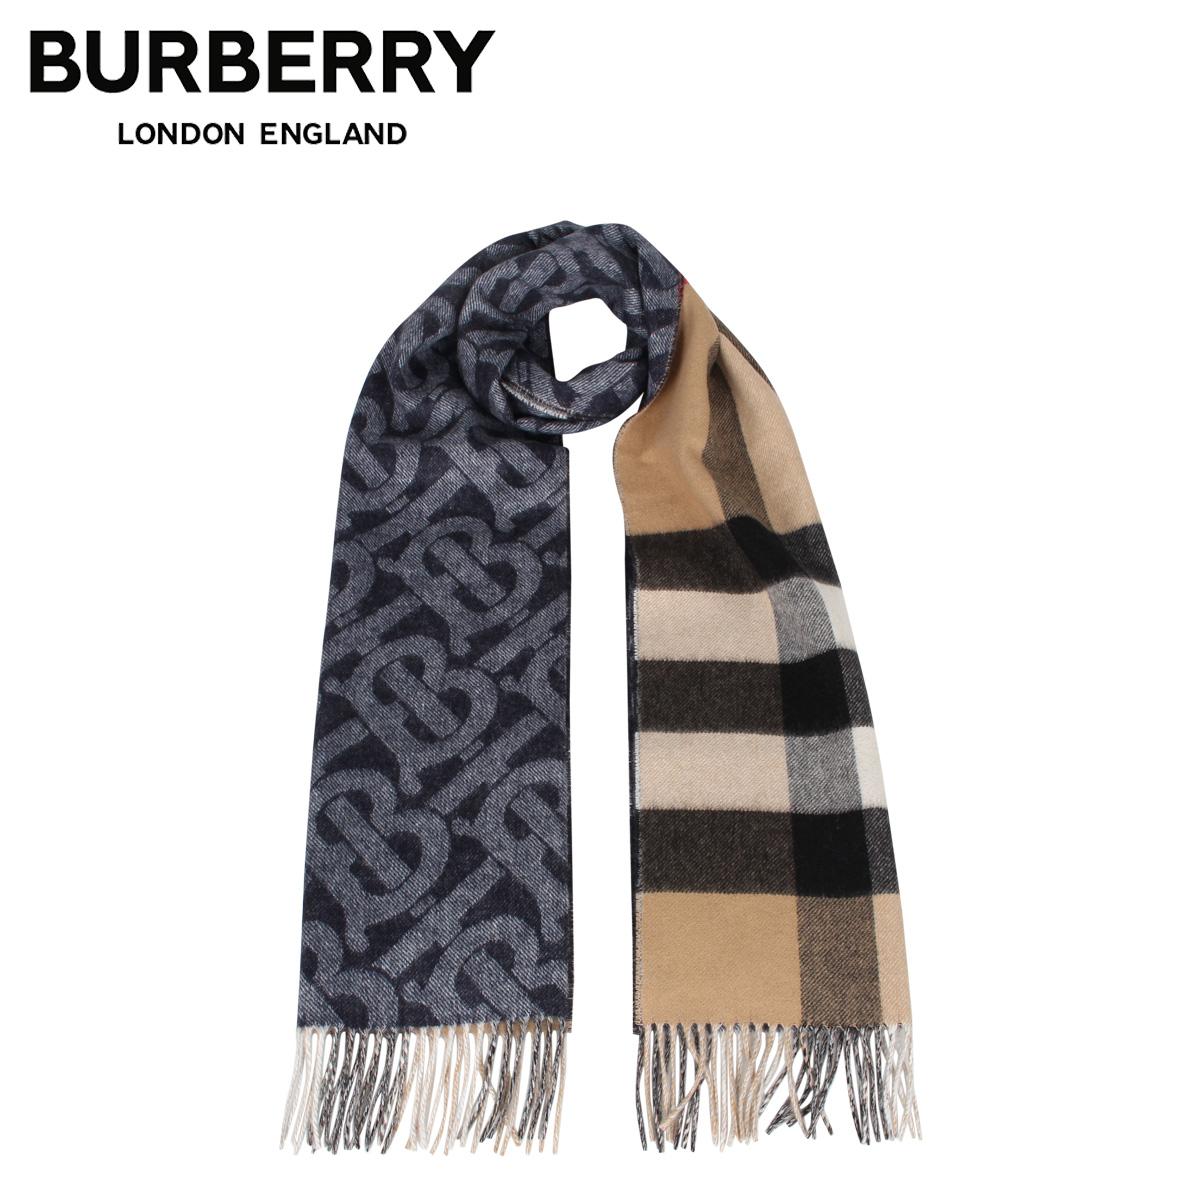 BURBERRY バーバリー マフラー スカーフ メンズ レディース チェック MUFFLER インディゴ 8024931